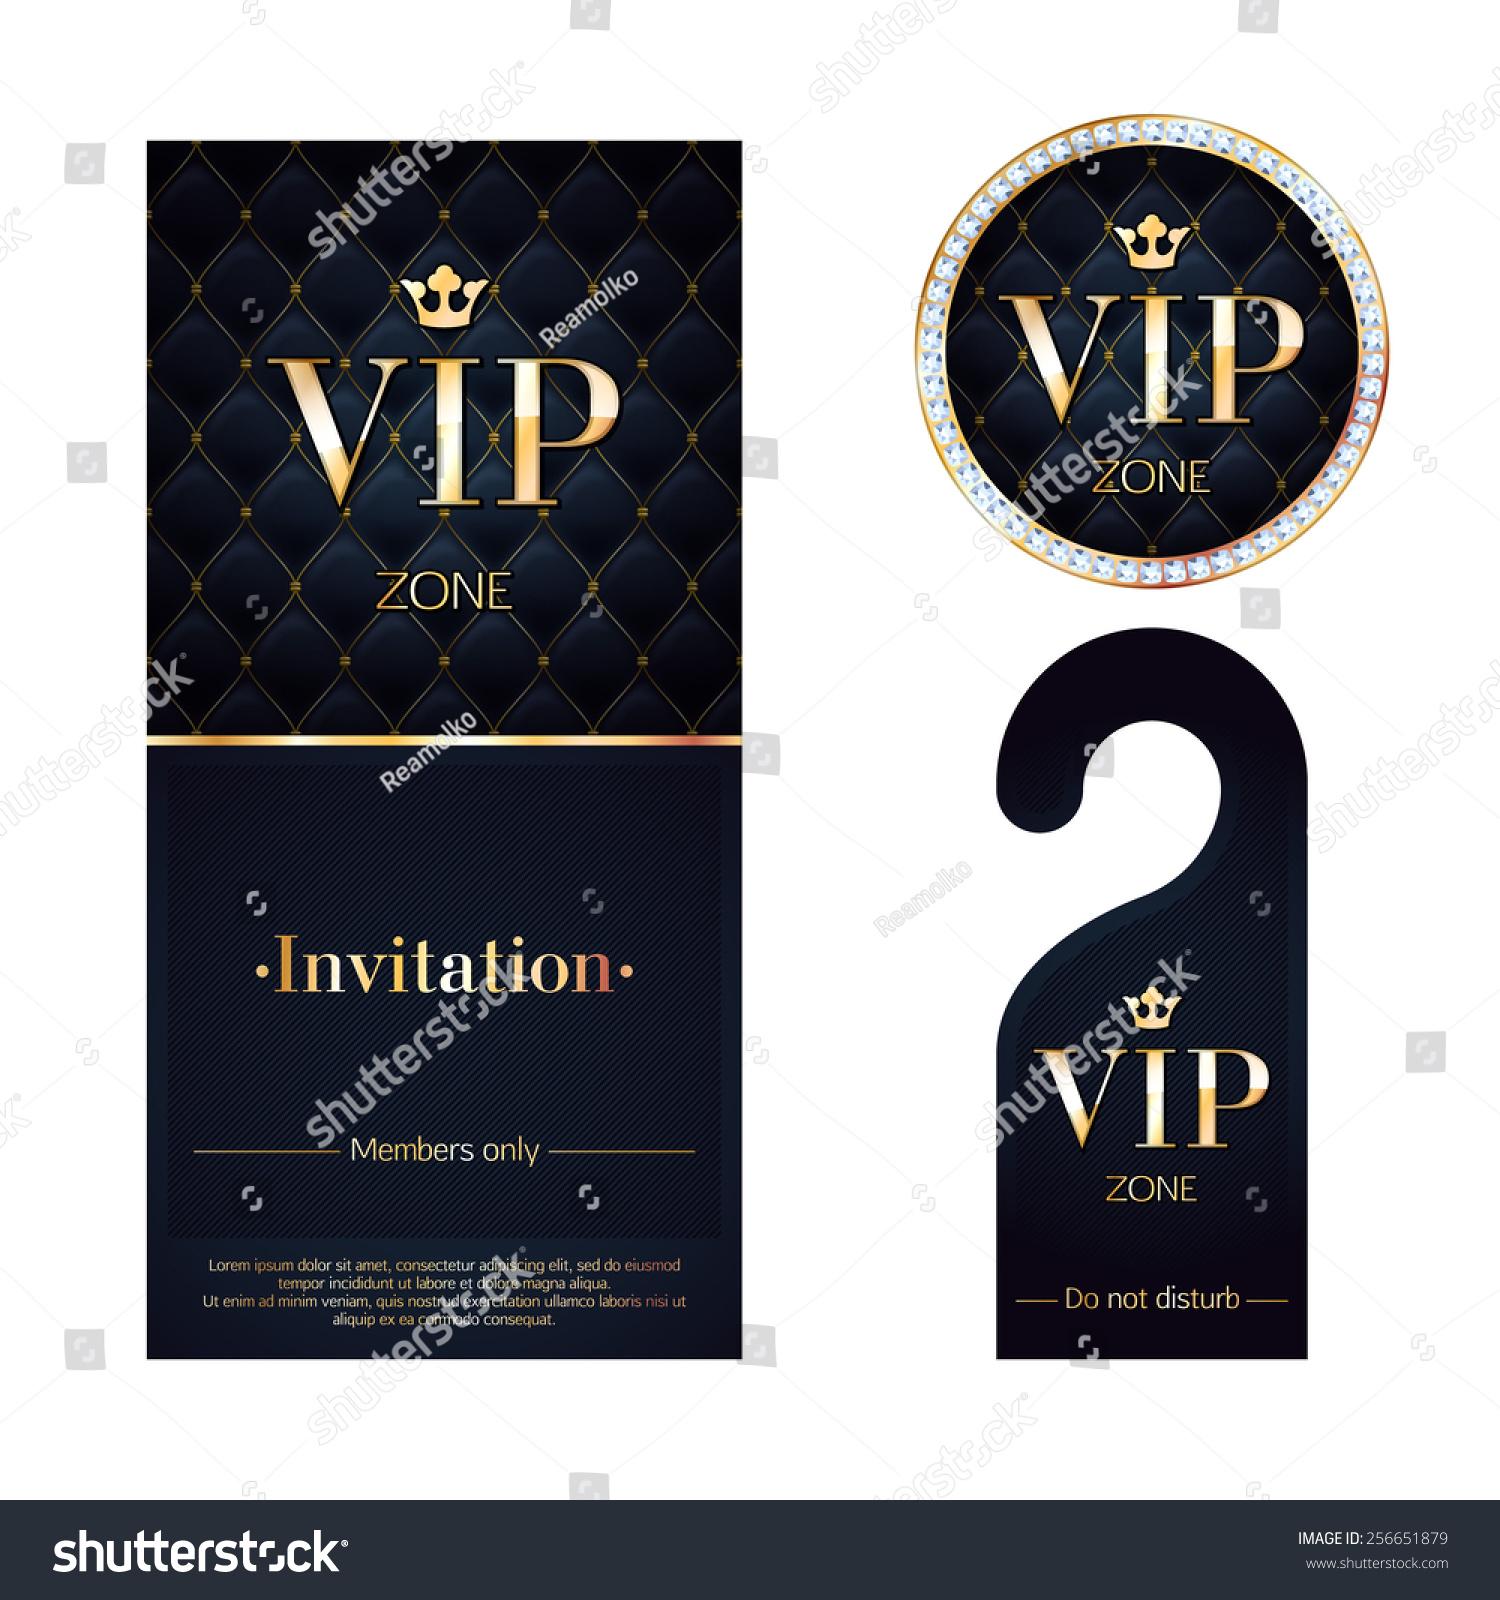 Costume Party Invitation as good invitation example